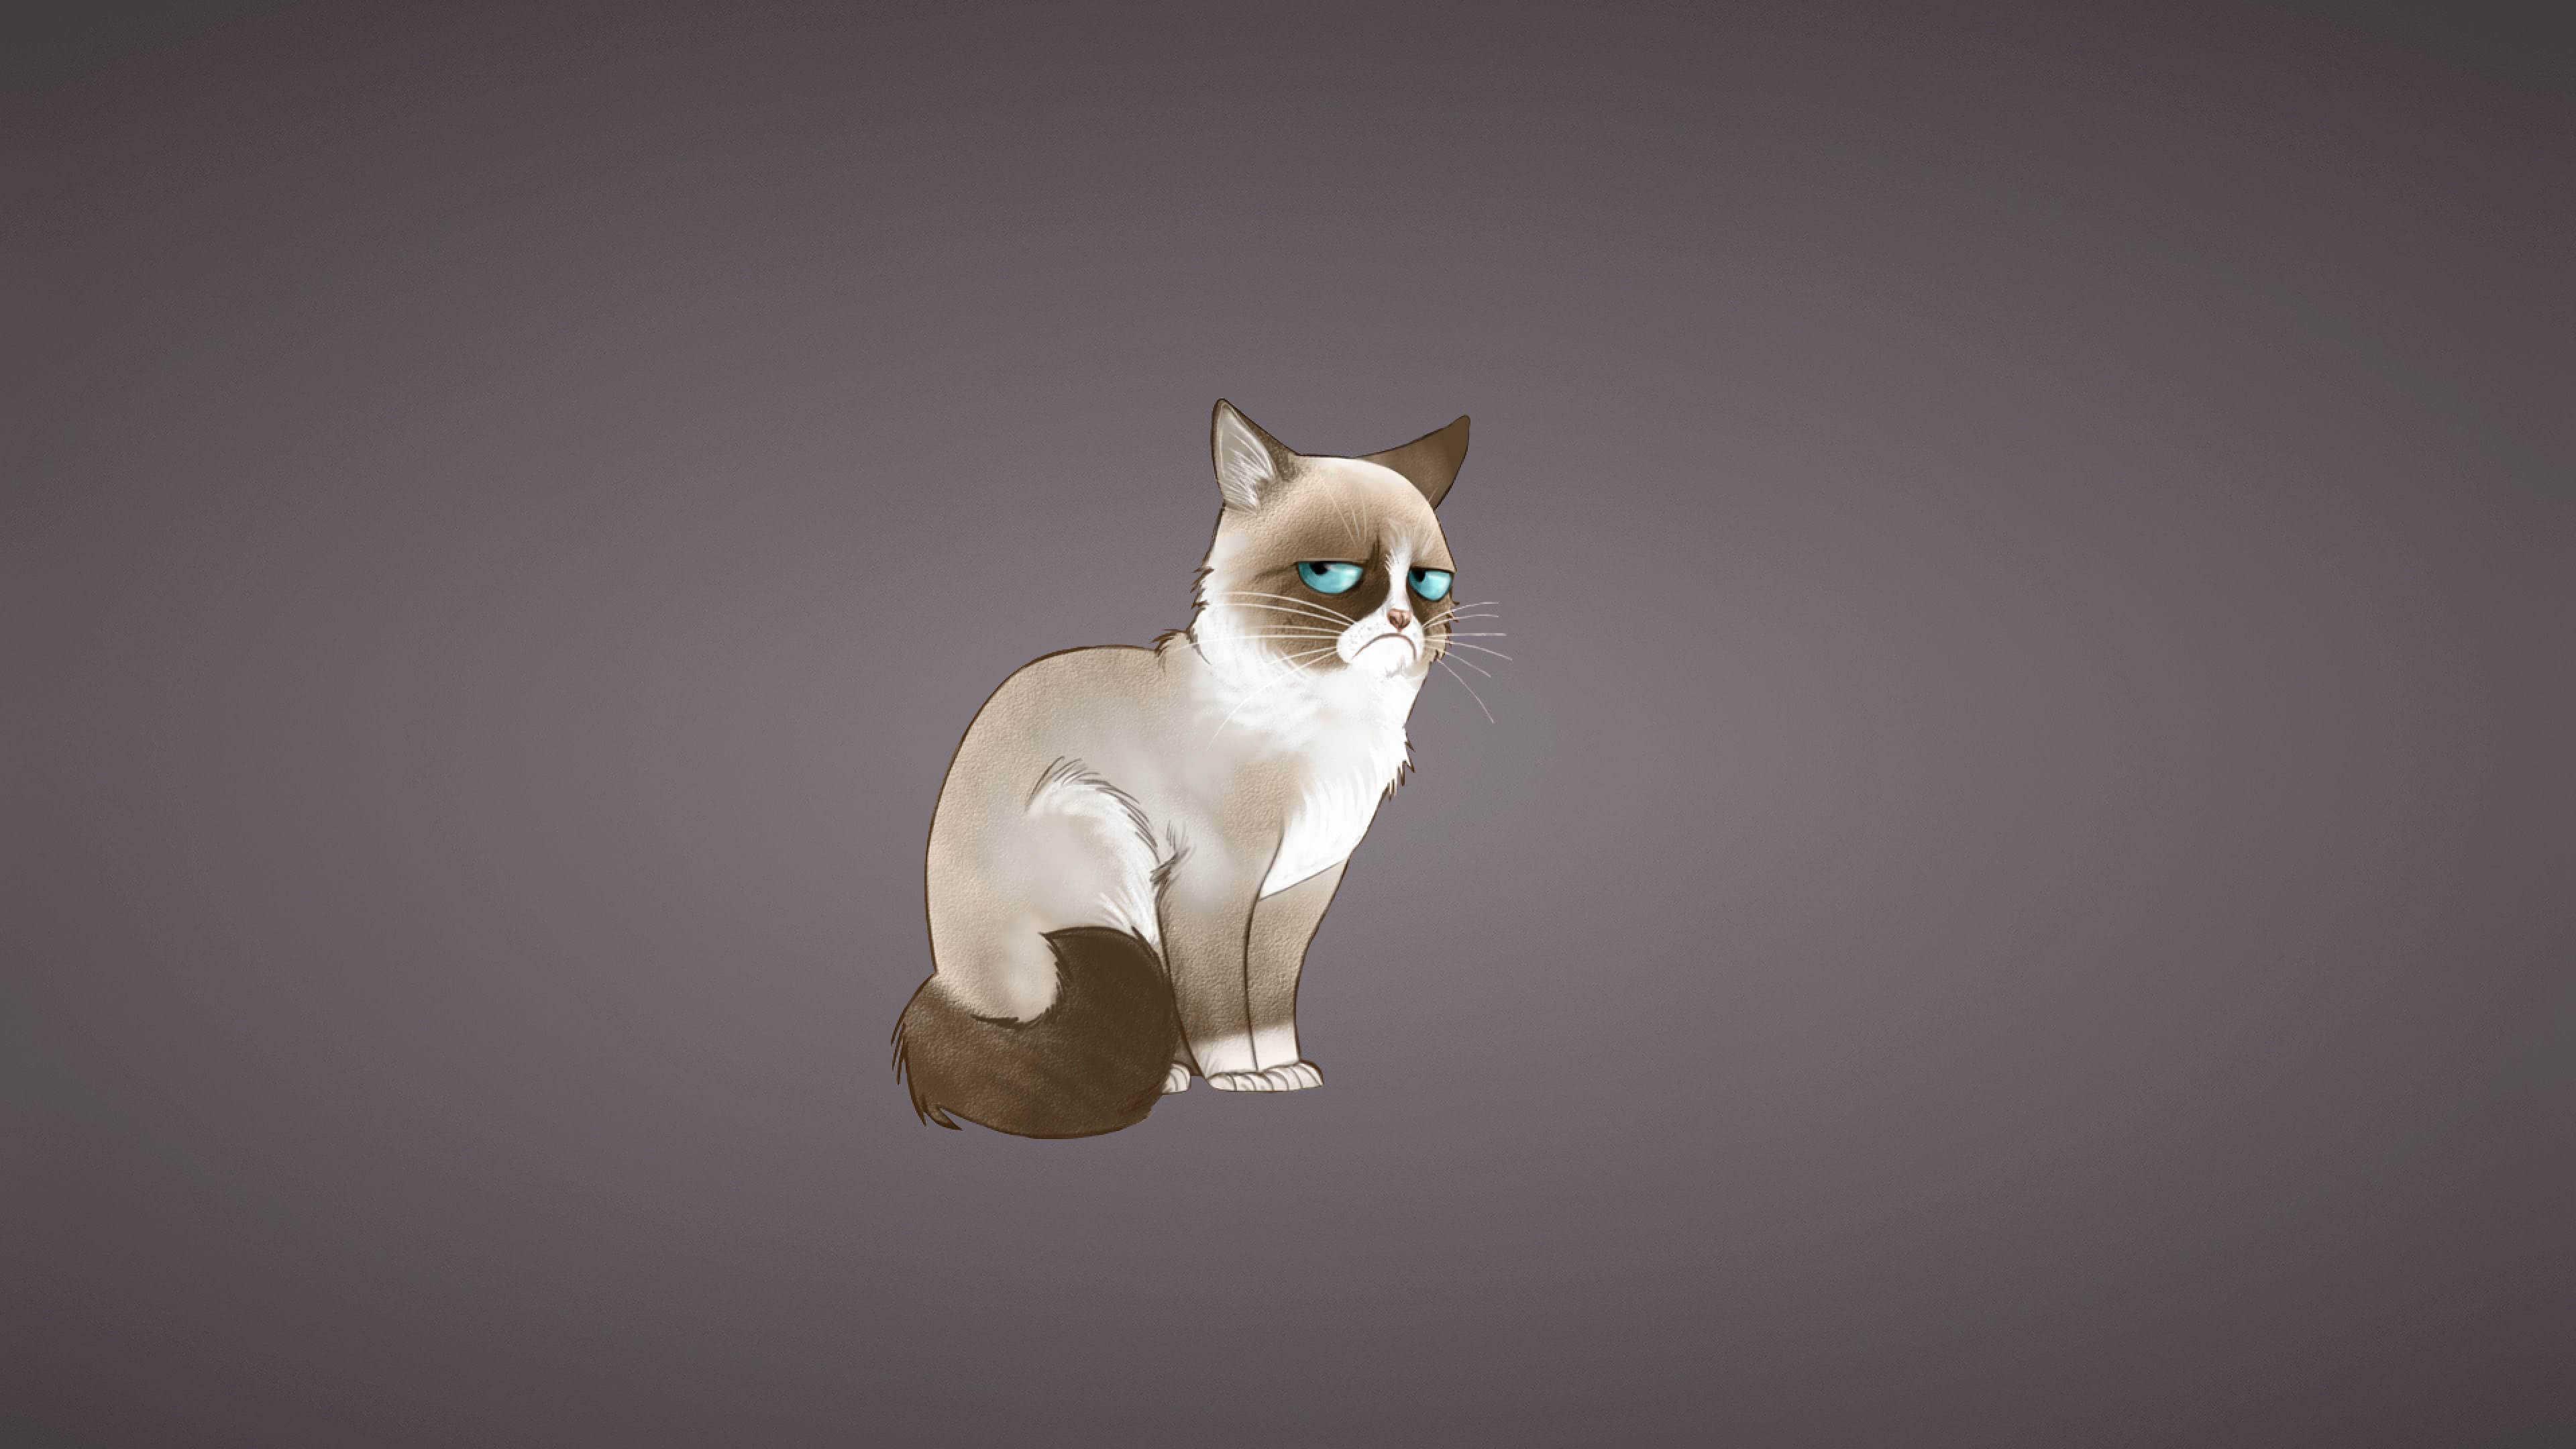 Destop Wallpaper Cars Grumpy Cat Meme Uhd 4k Wallpaper Pixelz